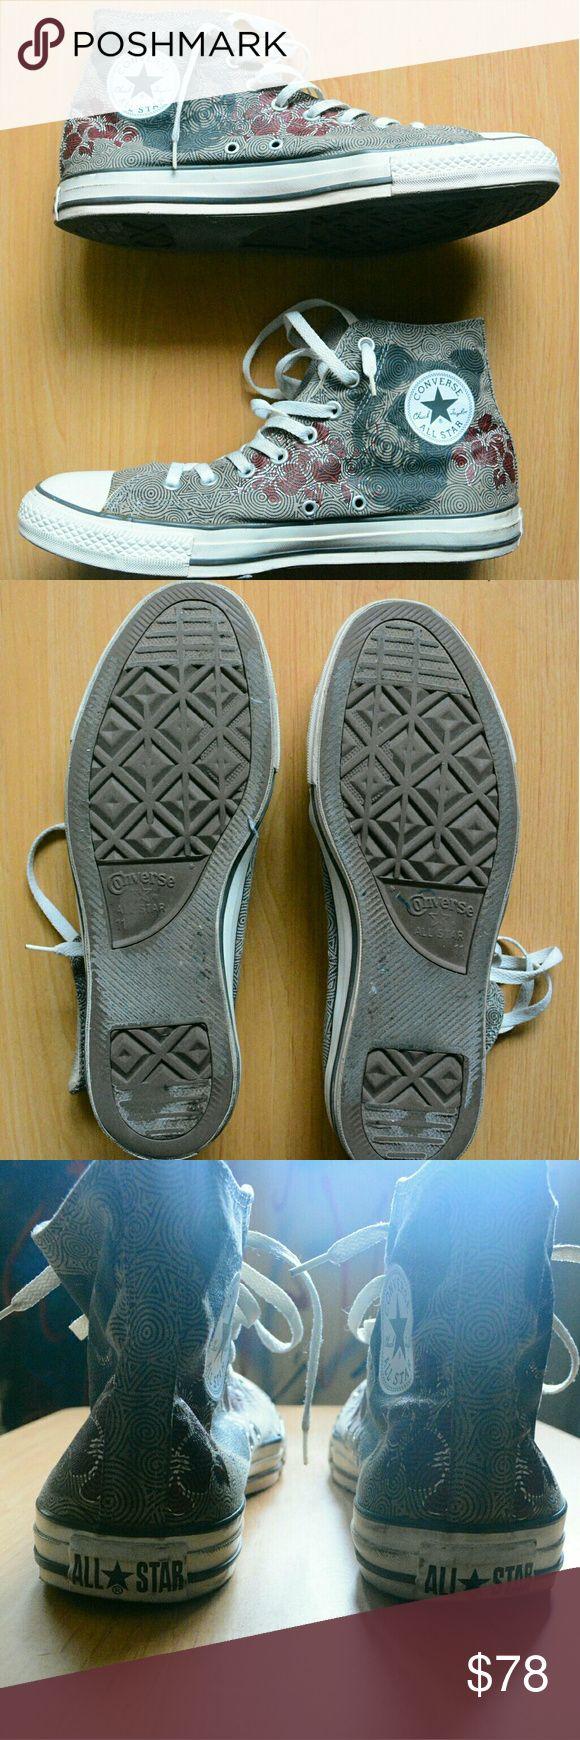 Men's Limited Edition Converse 11 US / 45 EUR Preowned; Men's Limited Edition Converse Chuck Taylor / Skull Design  Color: Tan, White, Gray  Size:  Men's 11 US / 11 UK / 45 EUR / 29.5 CM   - Wear / Clean Toe Box / Good Sole / No Holes  ****Without Original Box Converse Shoes Sneakers